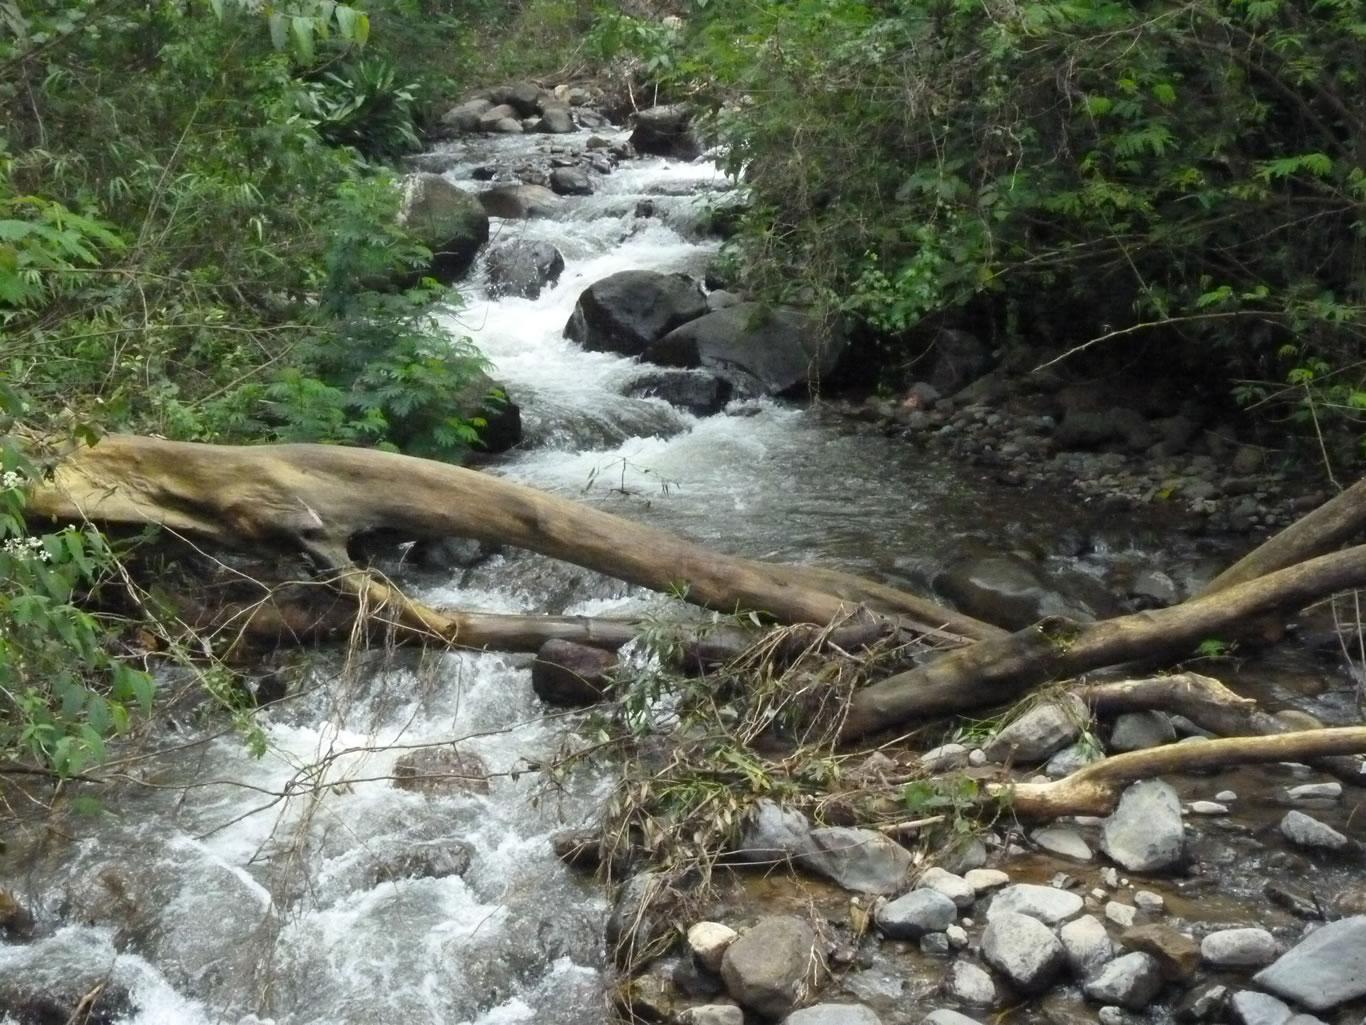 potret-alamiah-sungai-citamiang-anakan-sungai-ciliwung-masih-asri-dan-terjaga-menjadi-penghidupan-bagi-masyarakat-sekitar